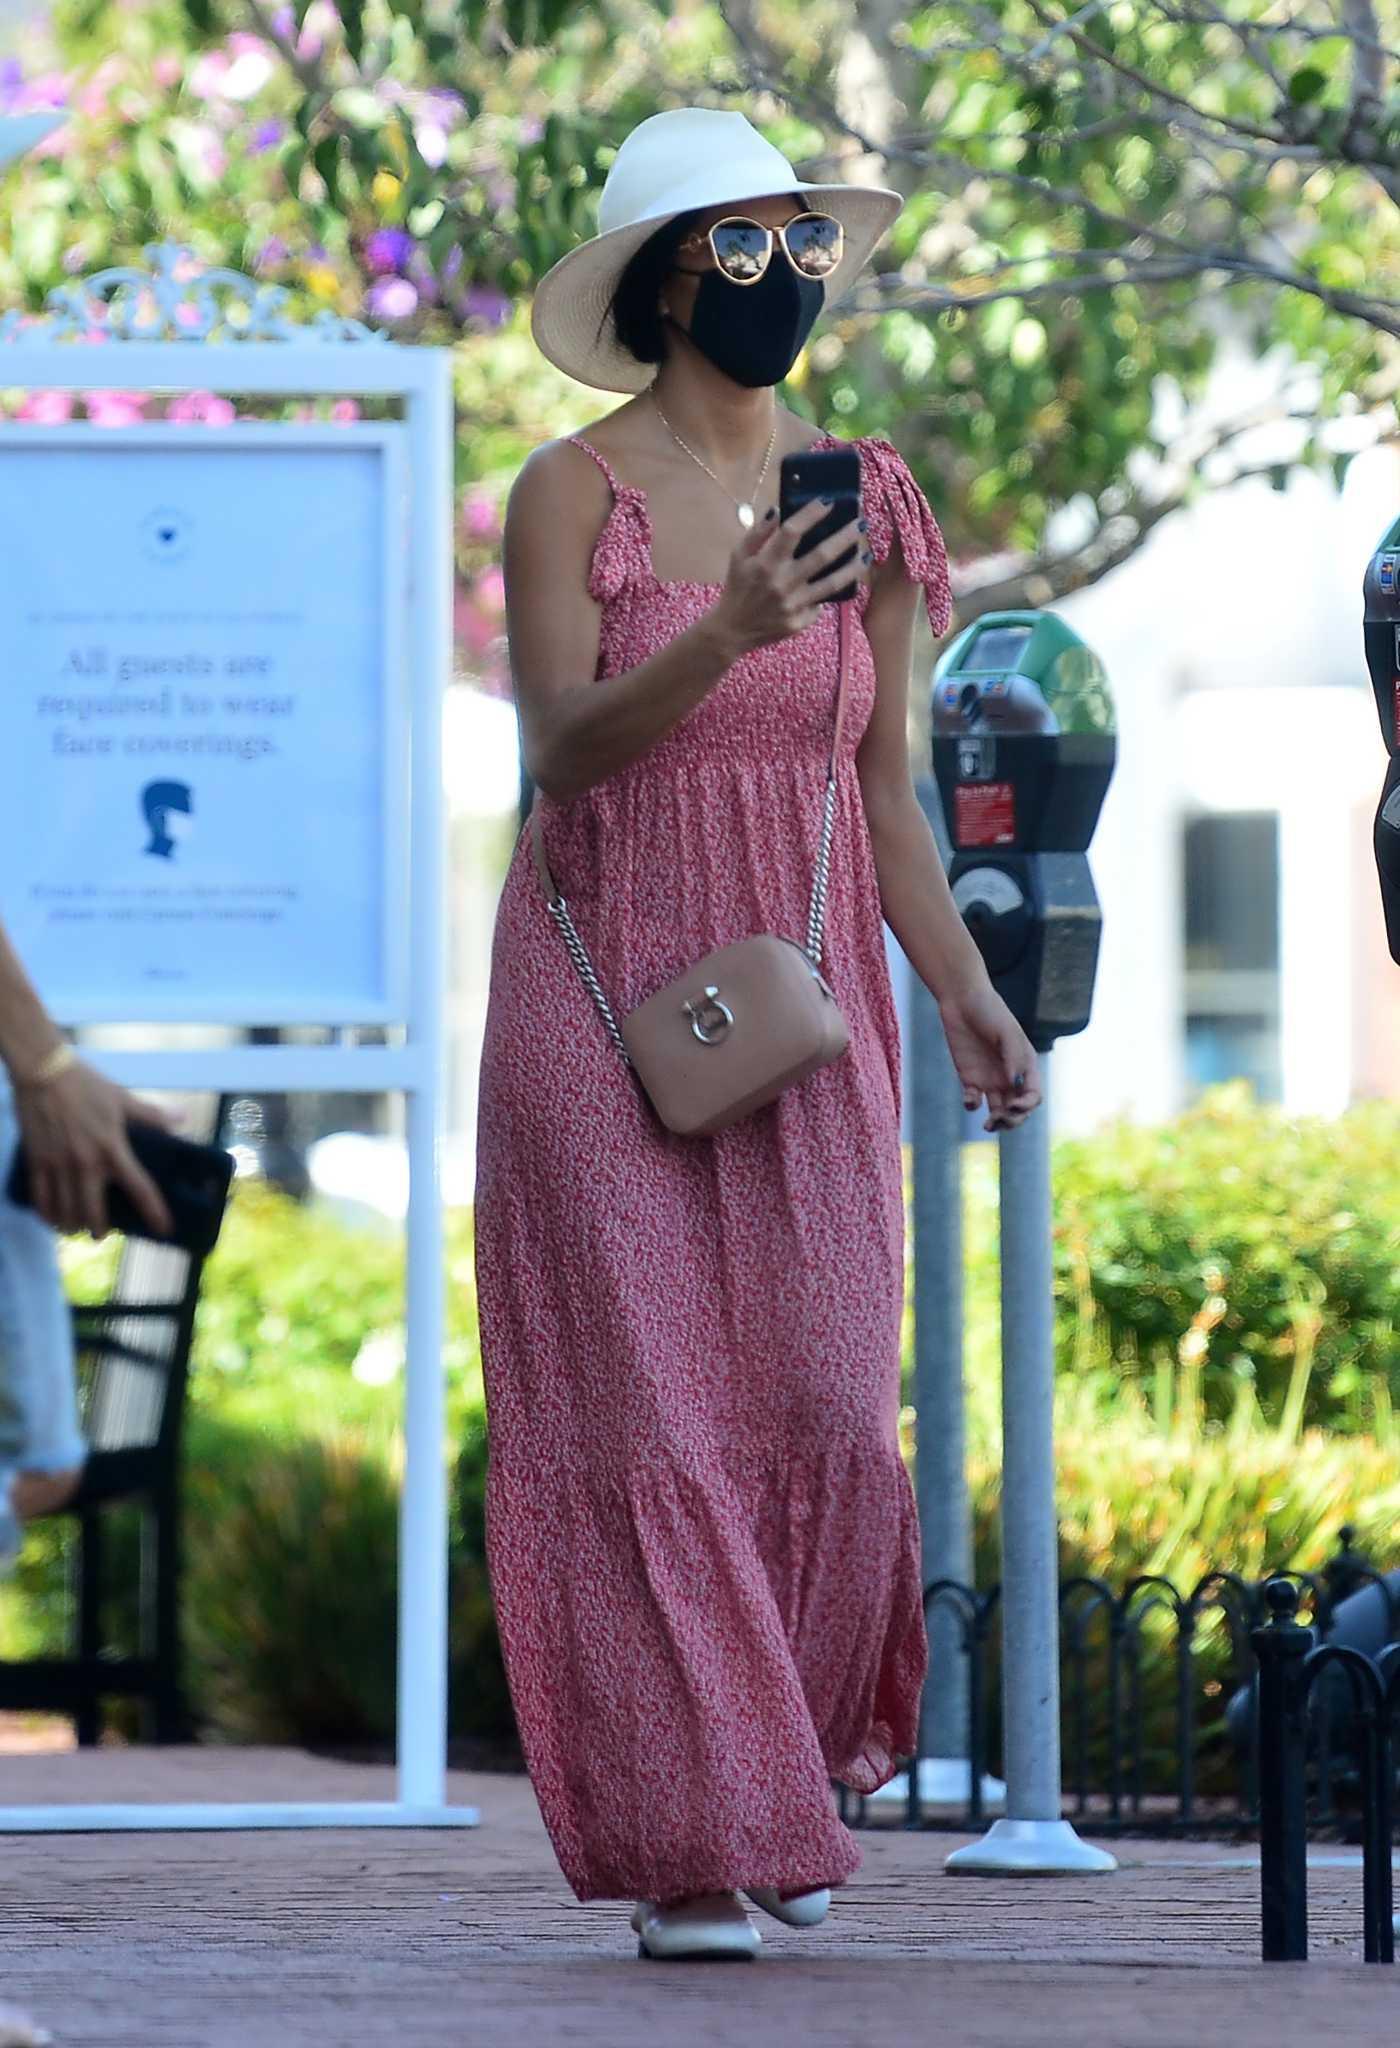 Nicole Scherzinger in a Pink Summer Dress Was Seen Out in Los Angeles 10/20/2020